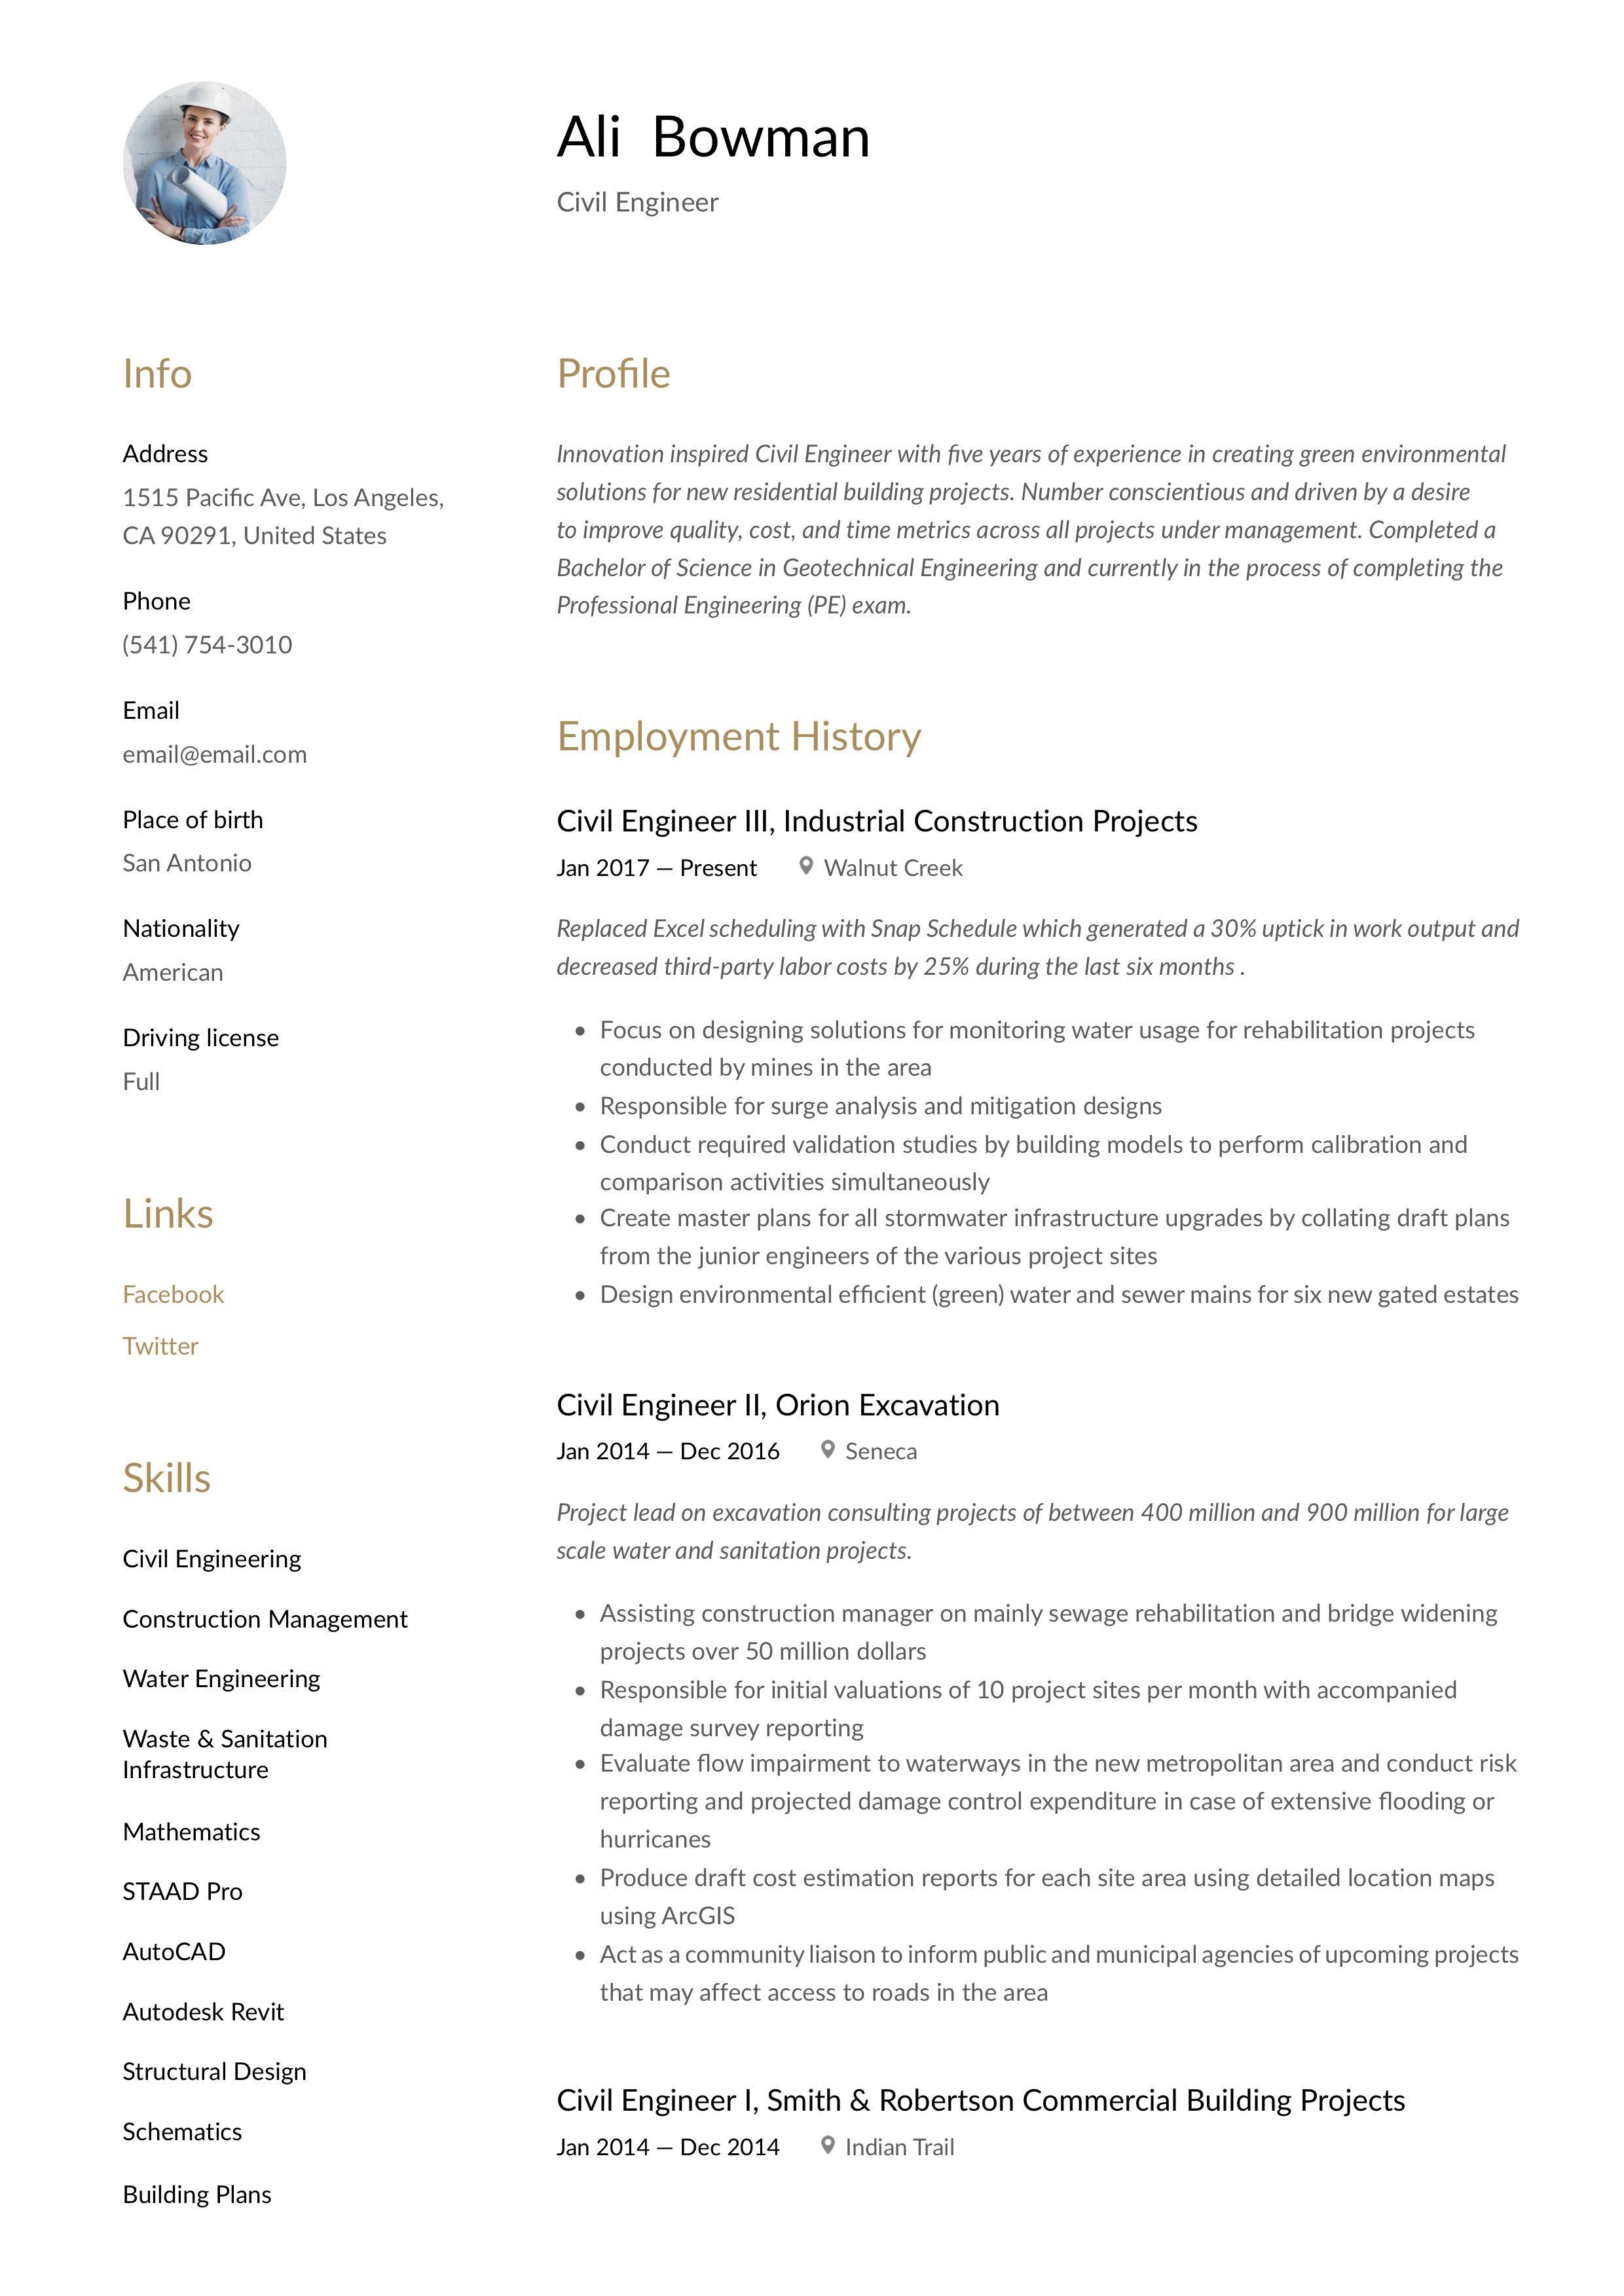 Civil engineer resume writing guide in 2020 civil